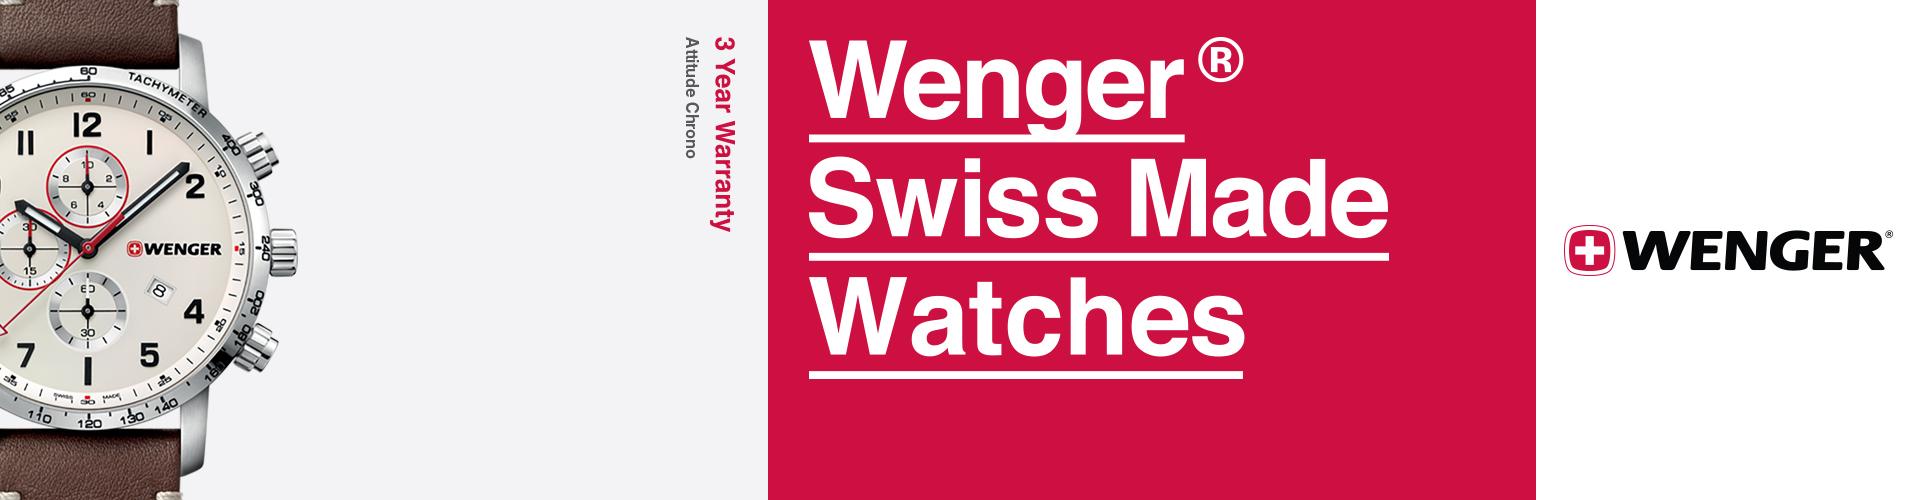 Wenger Блок 2 (моб)